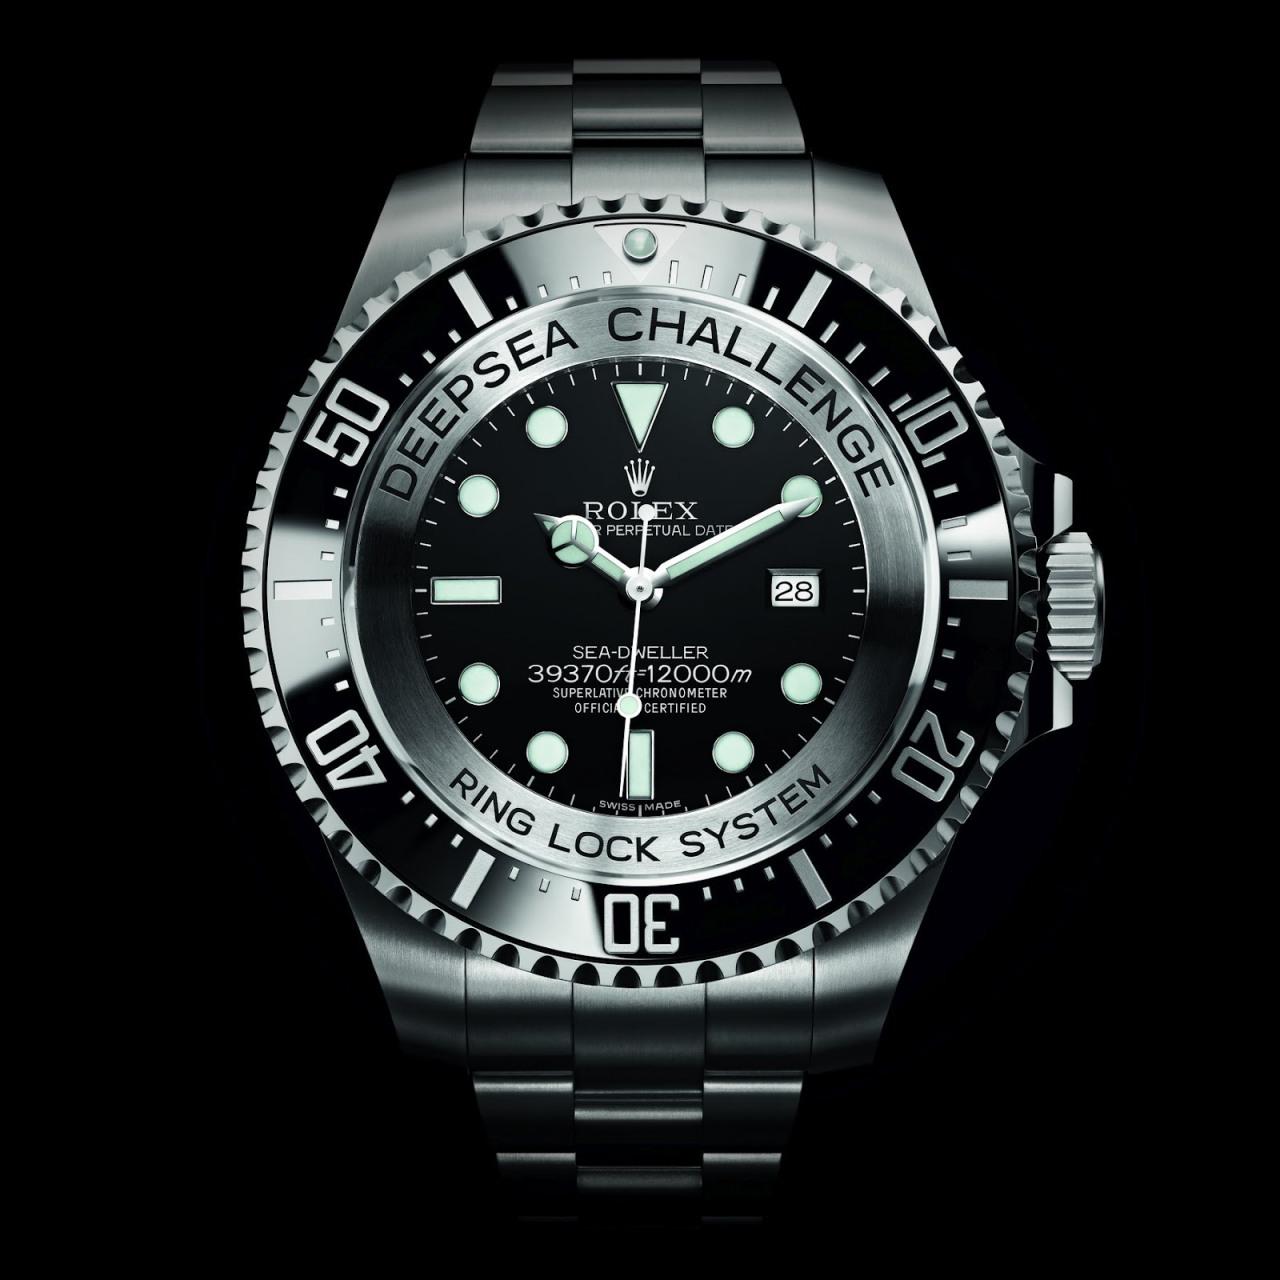 ROLEX Sea-Dweller Deepsea CHALLENGE 02[1]